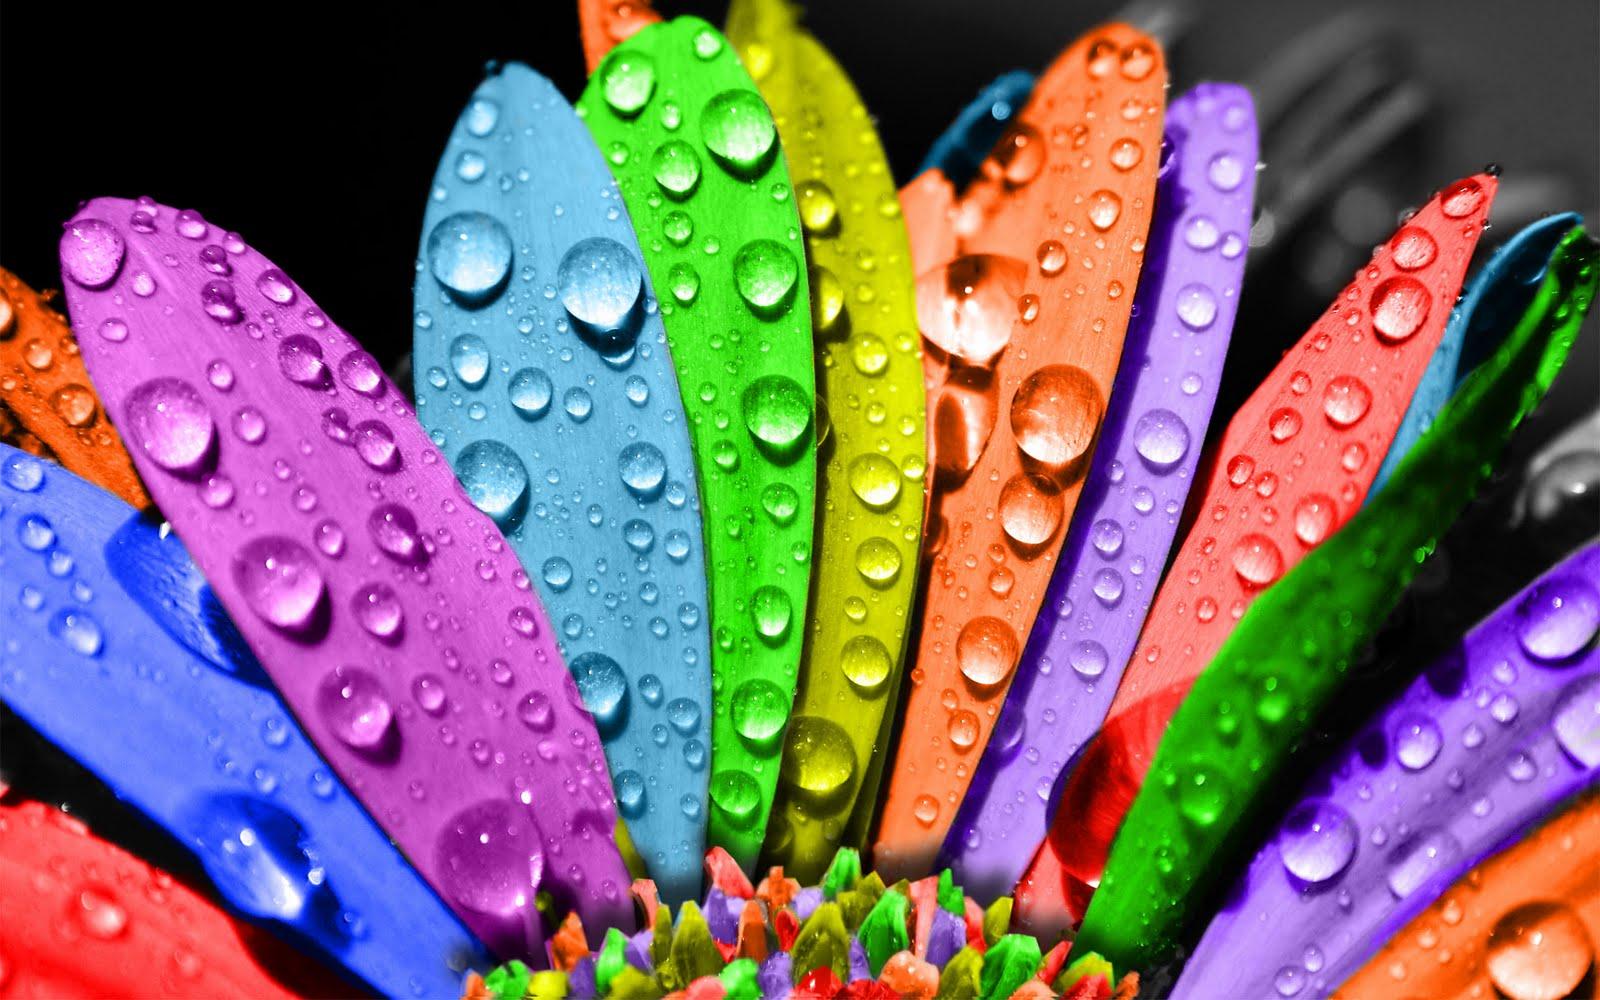 http://4.bp.blogspot.com/-7VfVfL1Jphg/TcqjrgHb-RI/AAAAAAAAChw/t2mL2rV1HiA/s1600/Wallpapers+of+Colours+and+Designs++%252811%2529.jpg